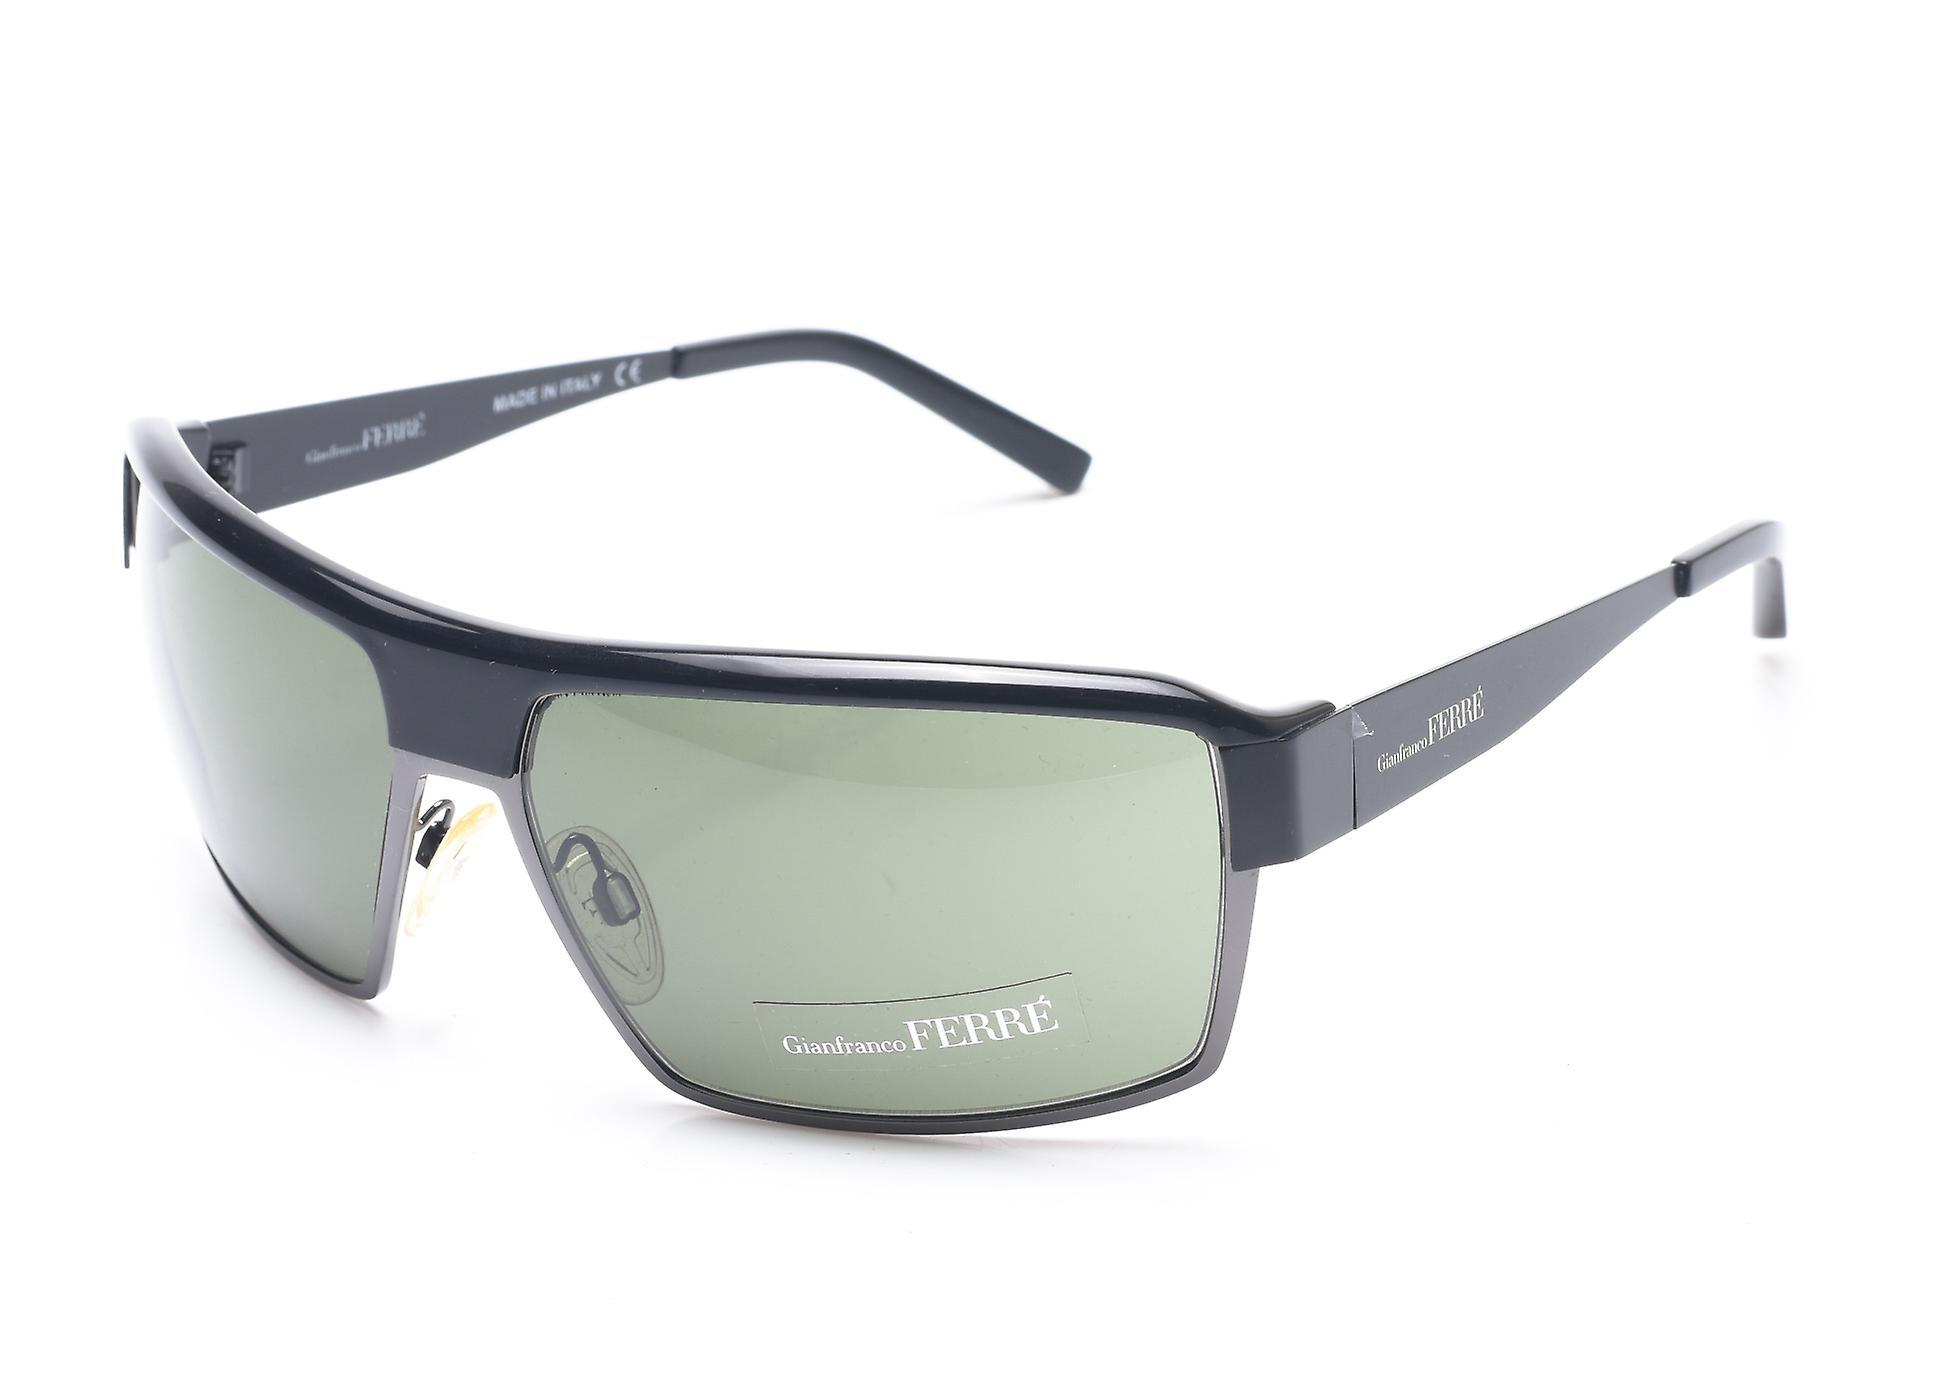 Gianfranco Ferre Women's Shield Sunglasses Gunmetal